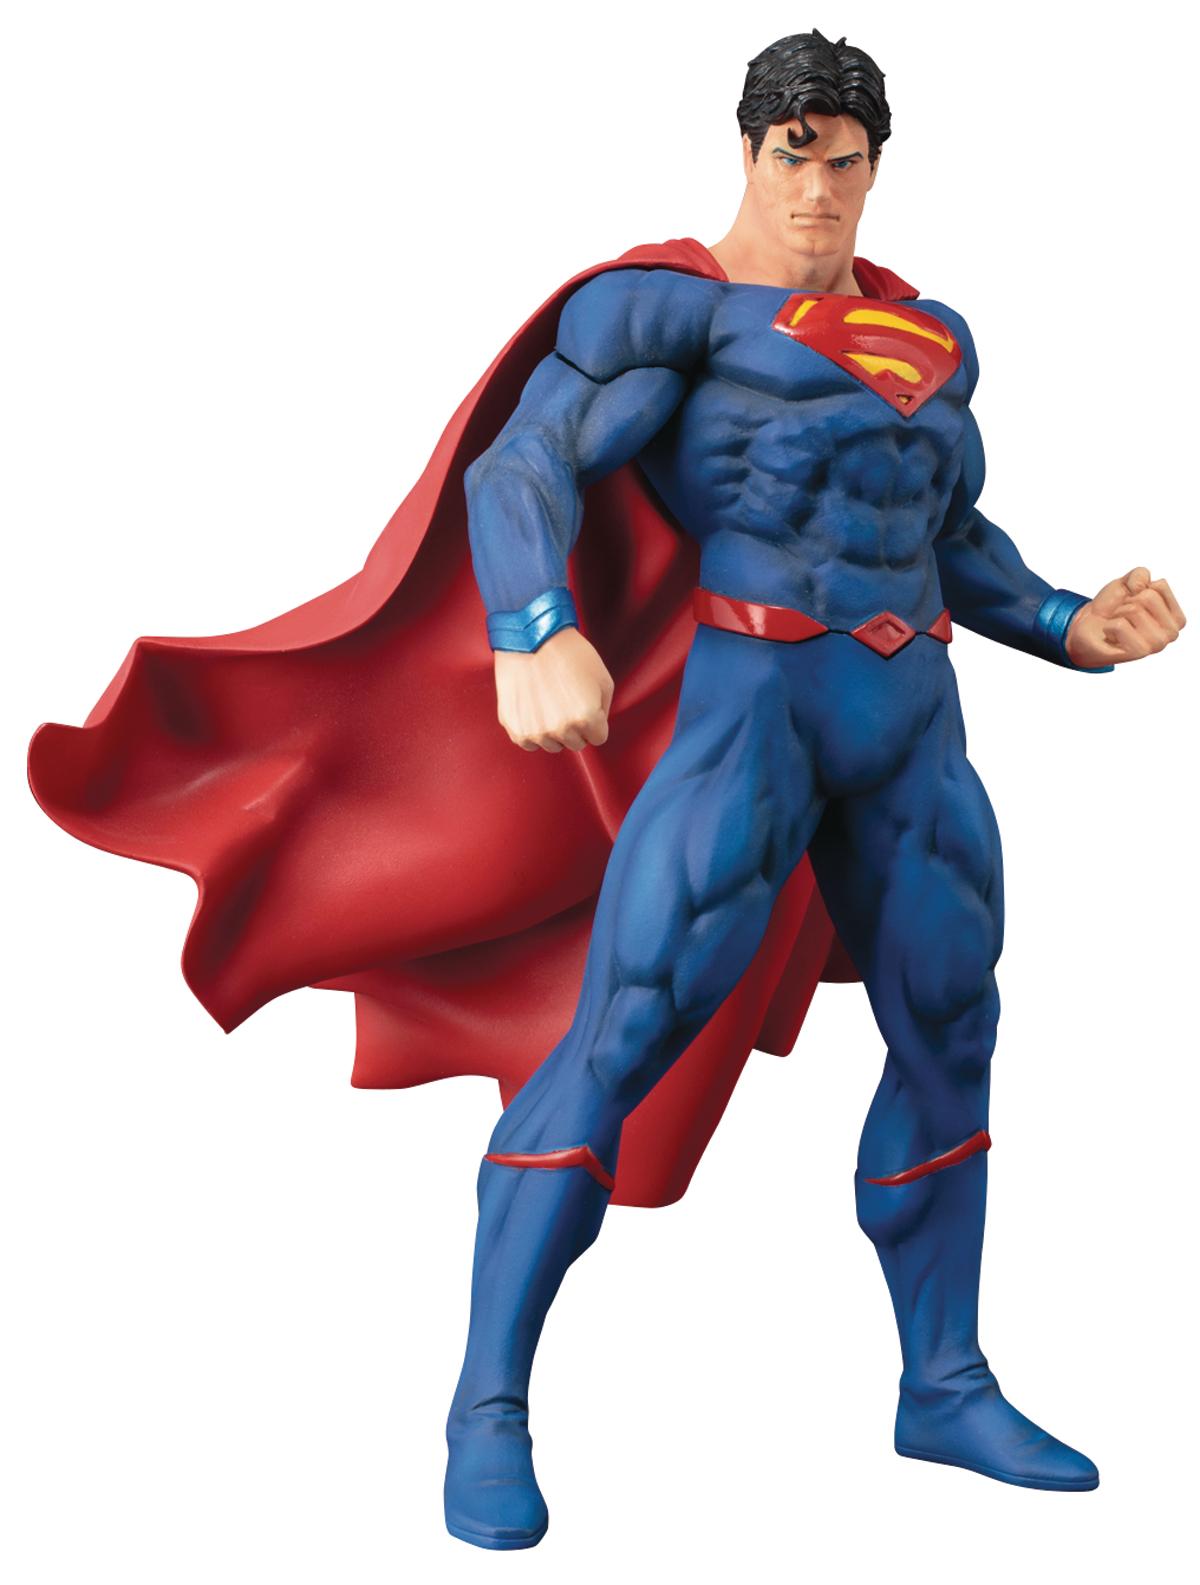 Superman Day - June 12